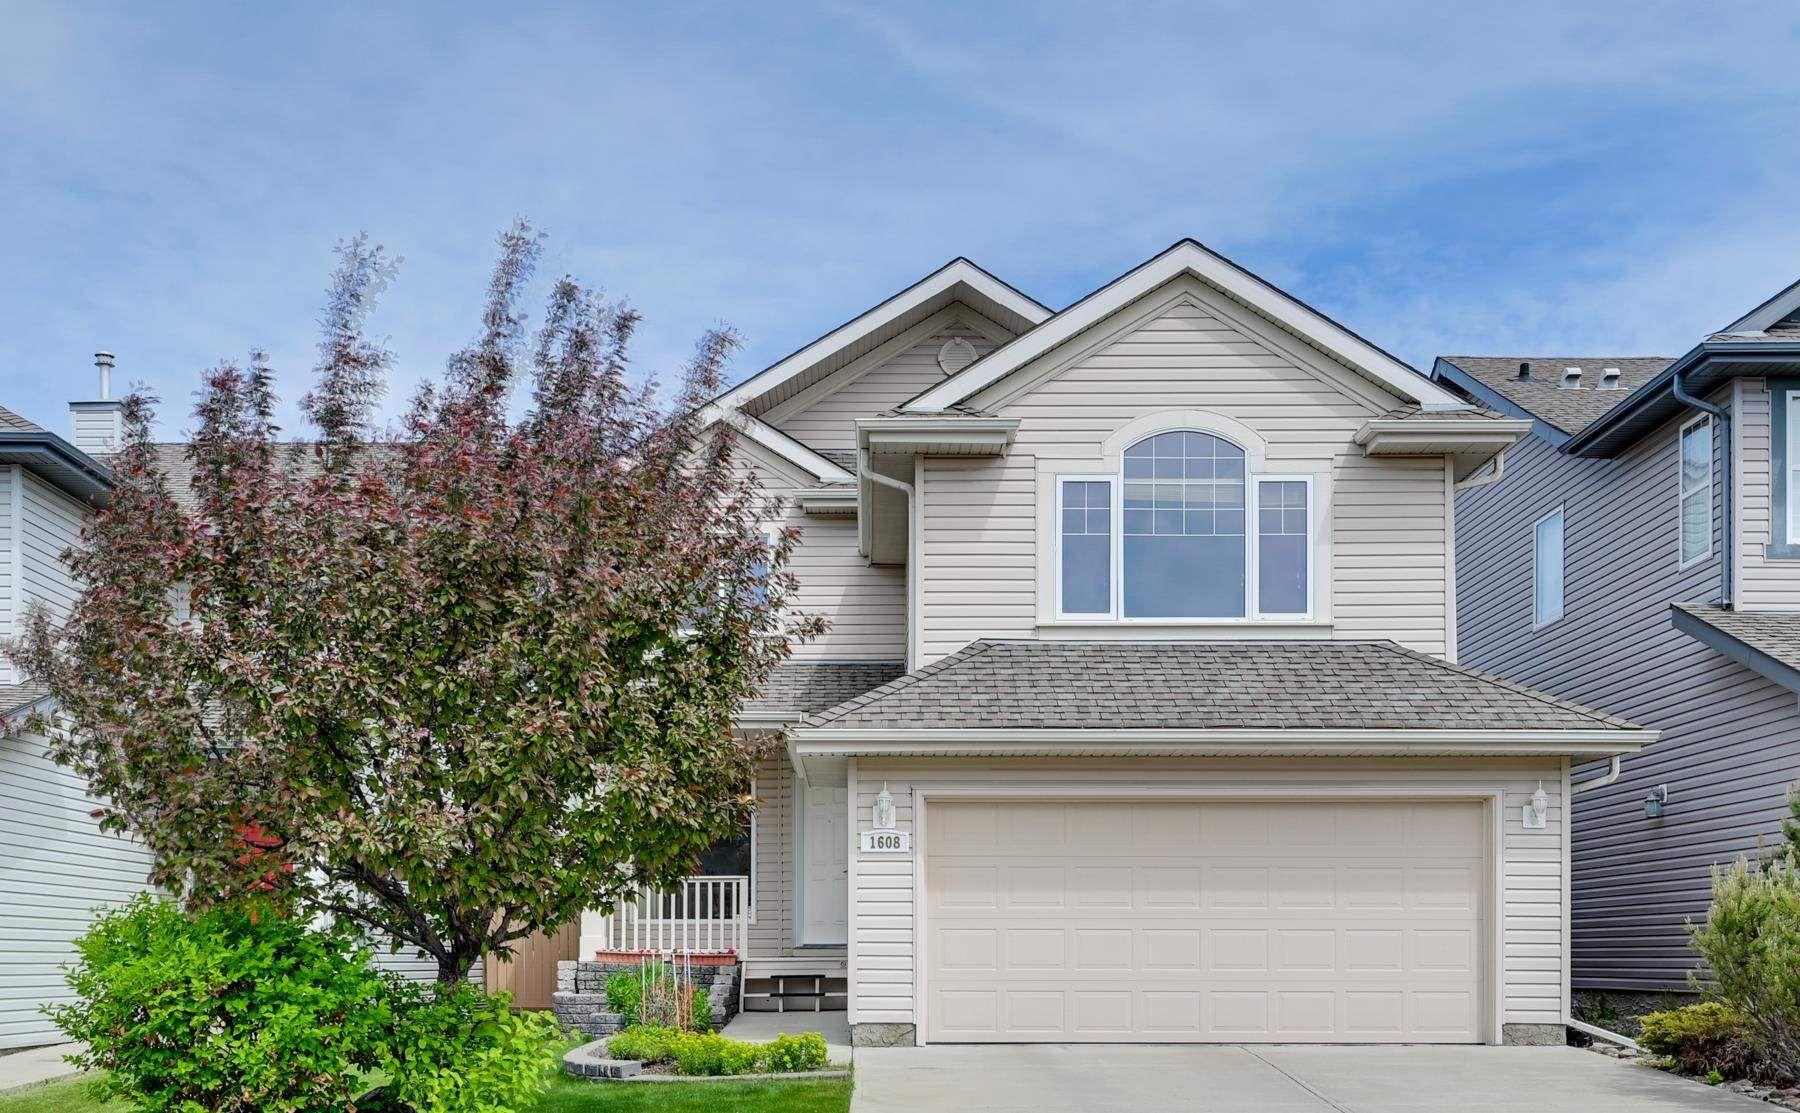 Main Photo: 1608 HODGSON Court in Edmonton: Zone 14 House for sale : MLS®# E4247502